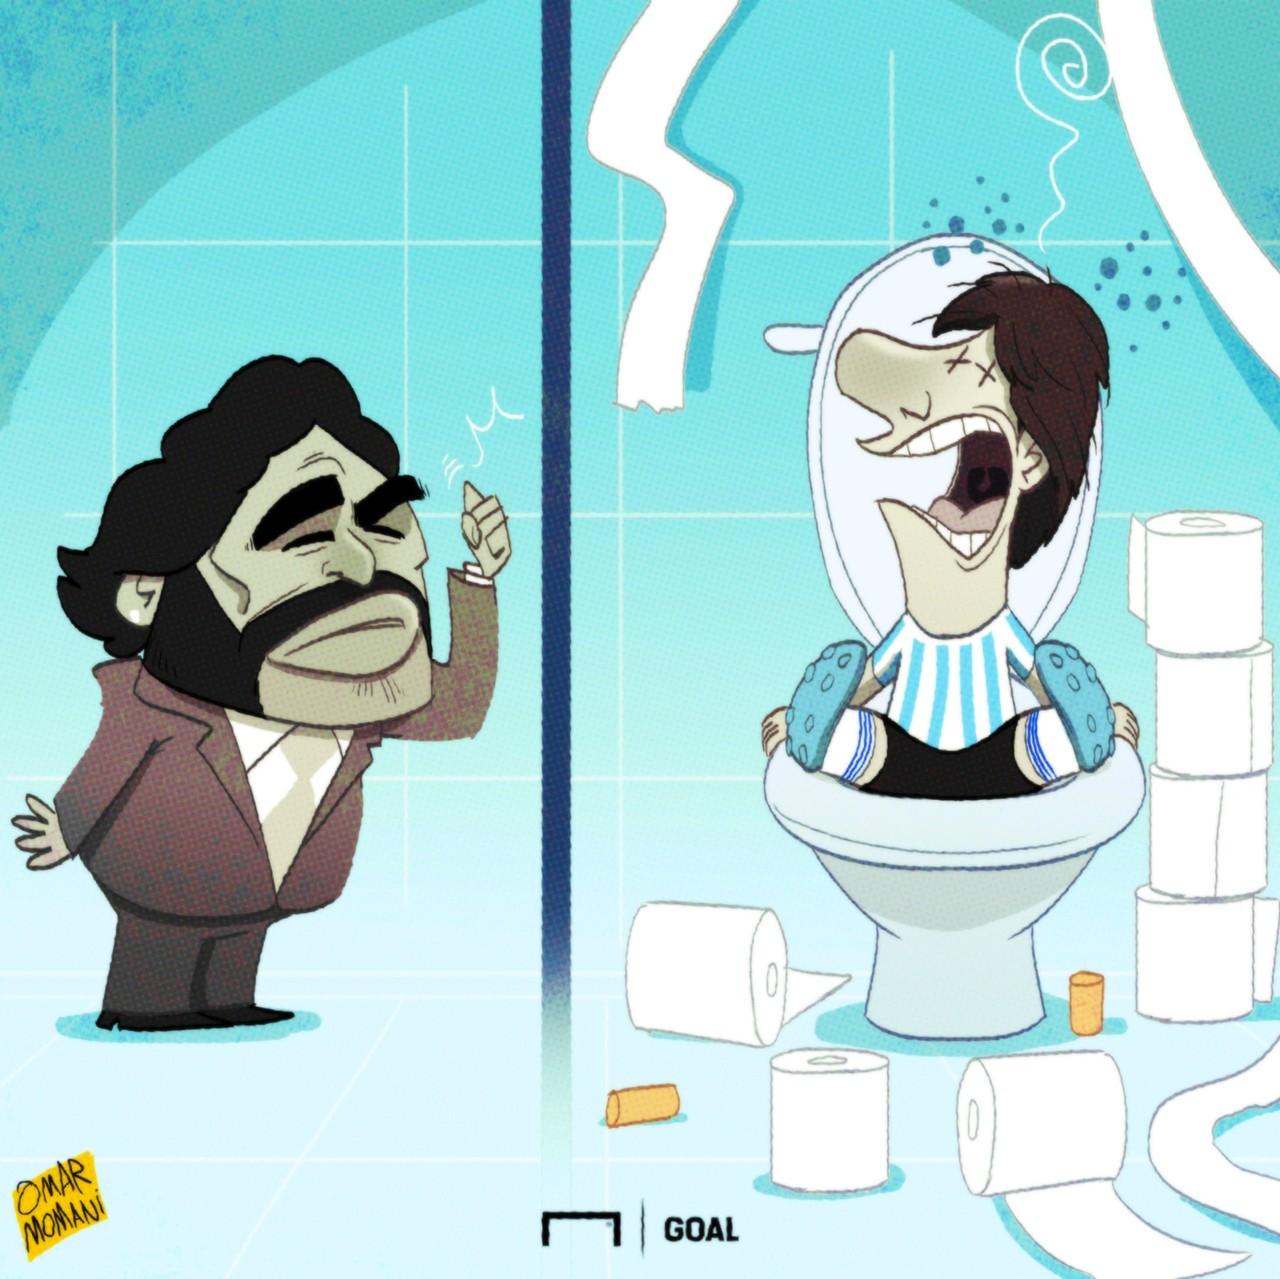 Messi's toilet troubles